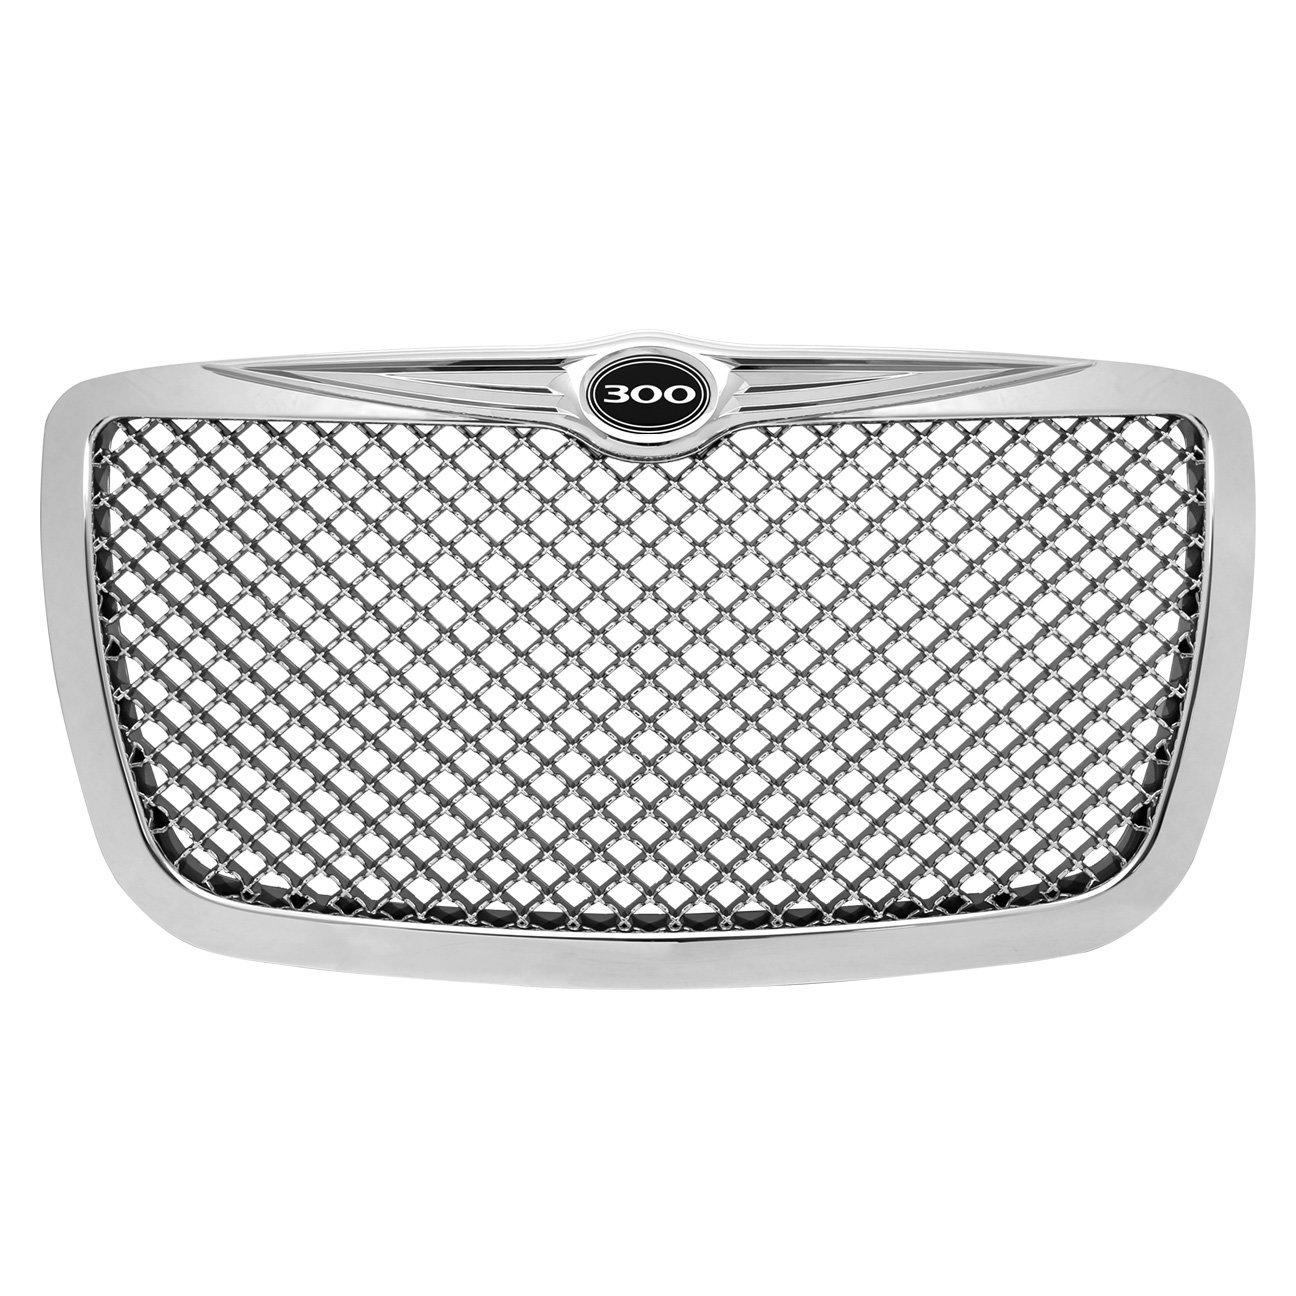 Ajp Distributors For Chrysler 300 300C Logo Emblem Badge Chrome Diamond Mesh Front Hood Bumper Grille Grill Replacement Upgrade